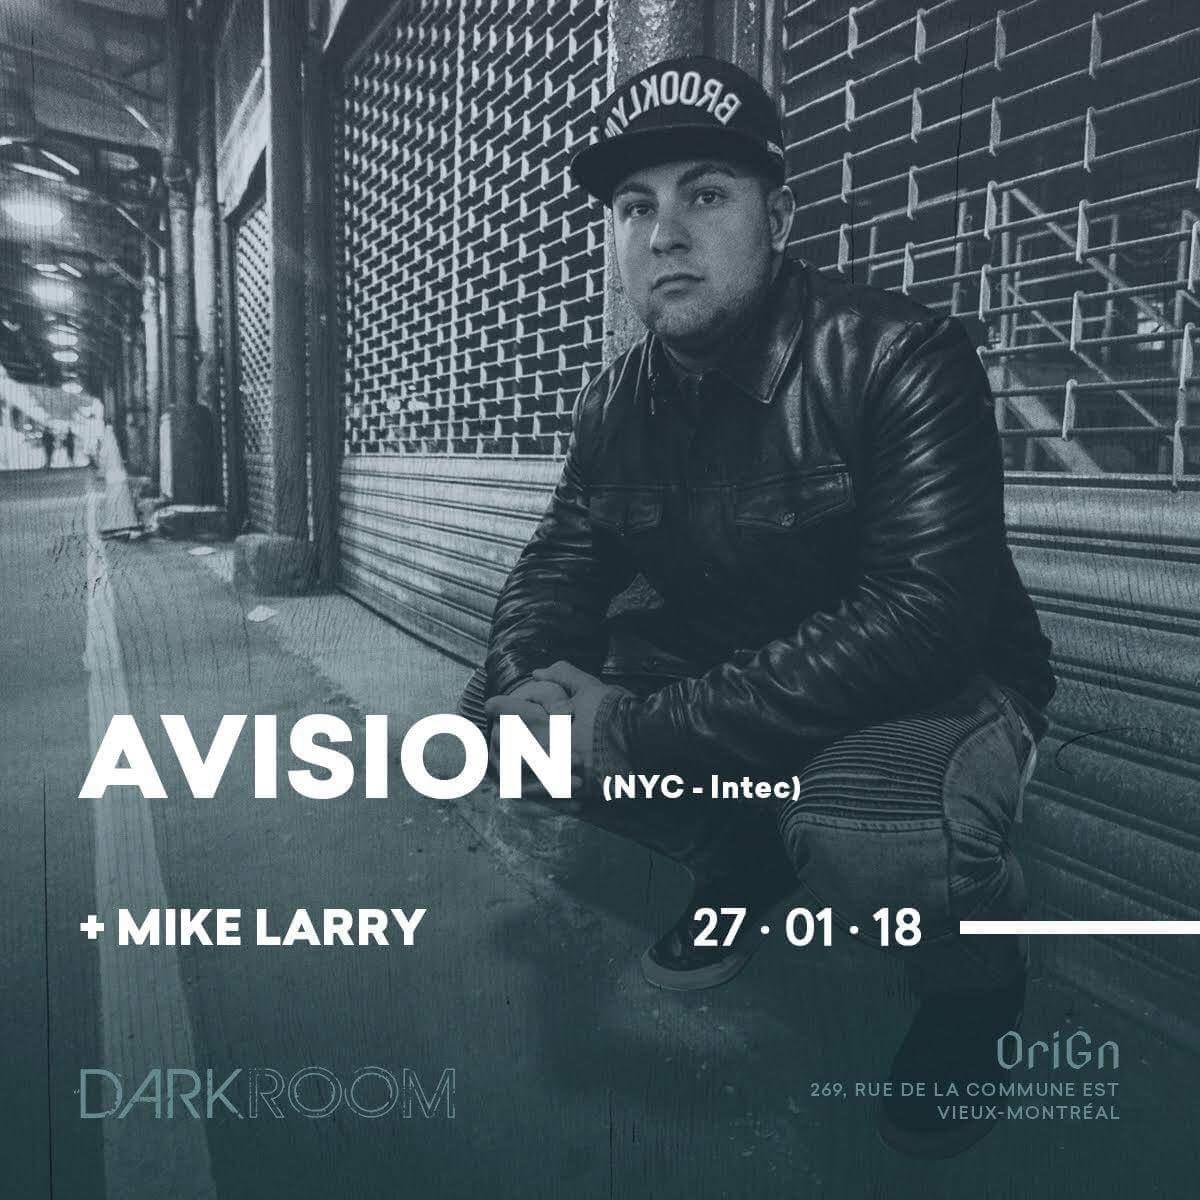 1.27.18 - Darkroom Montreal.jpg